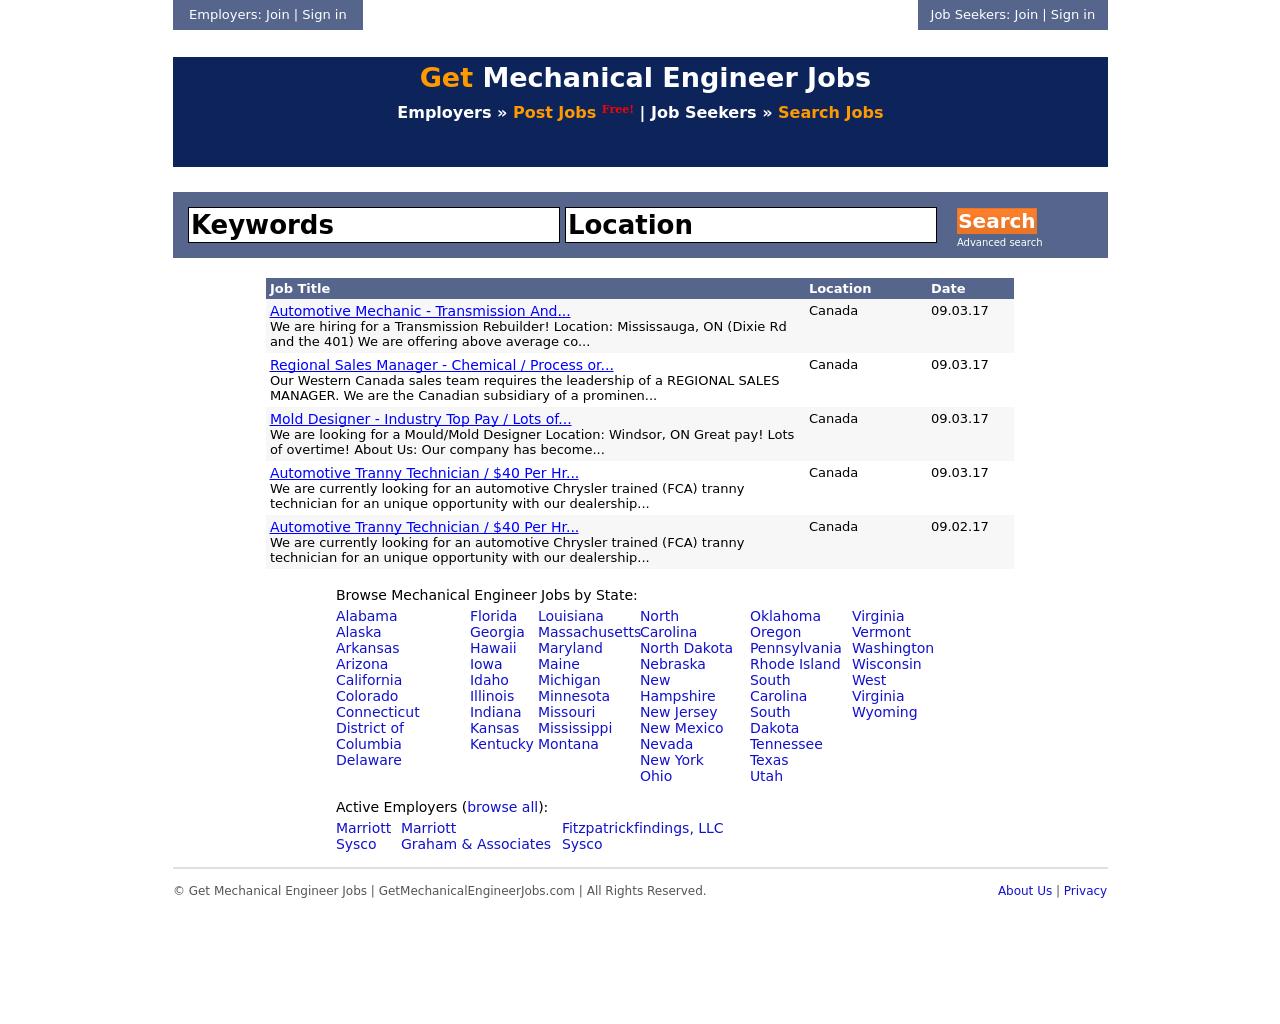 Get-Mechanical-Engineer-Jobs-Advertising-Reviews-Pricing